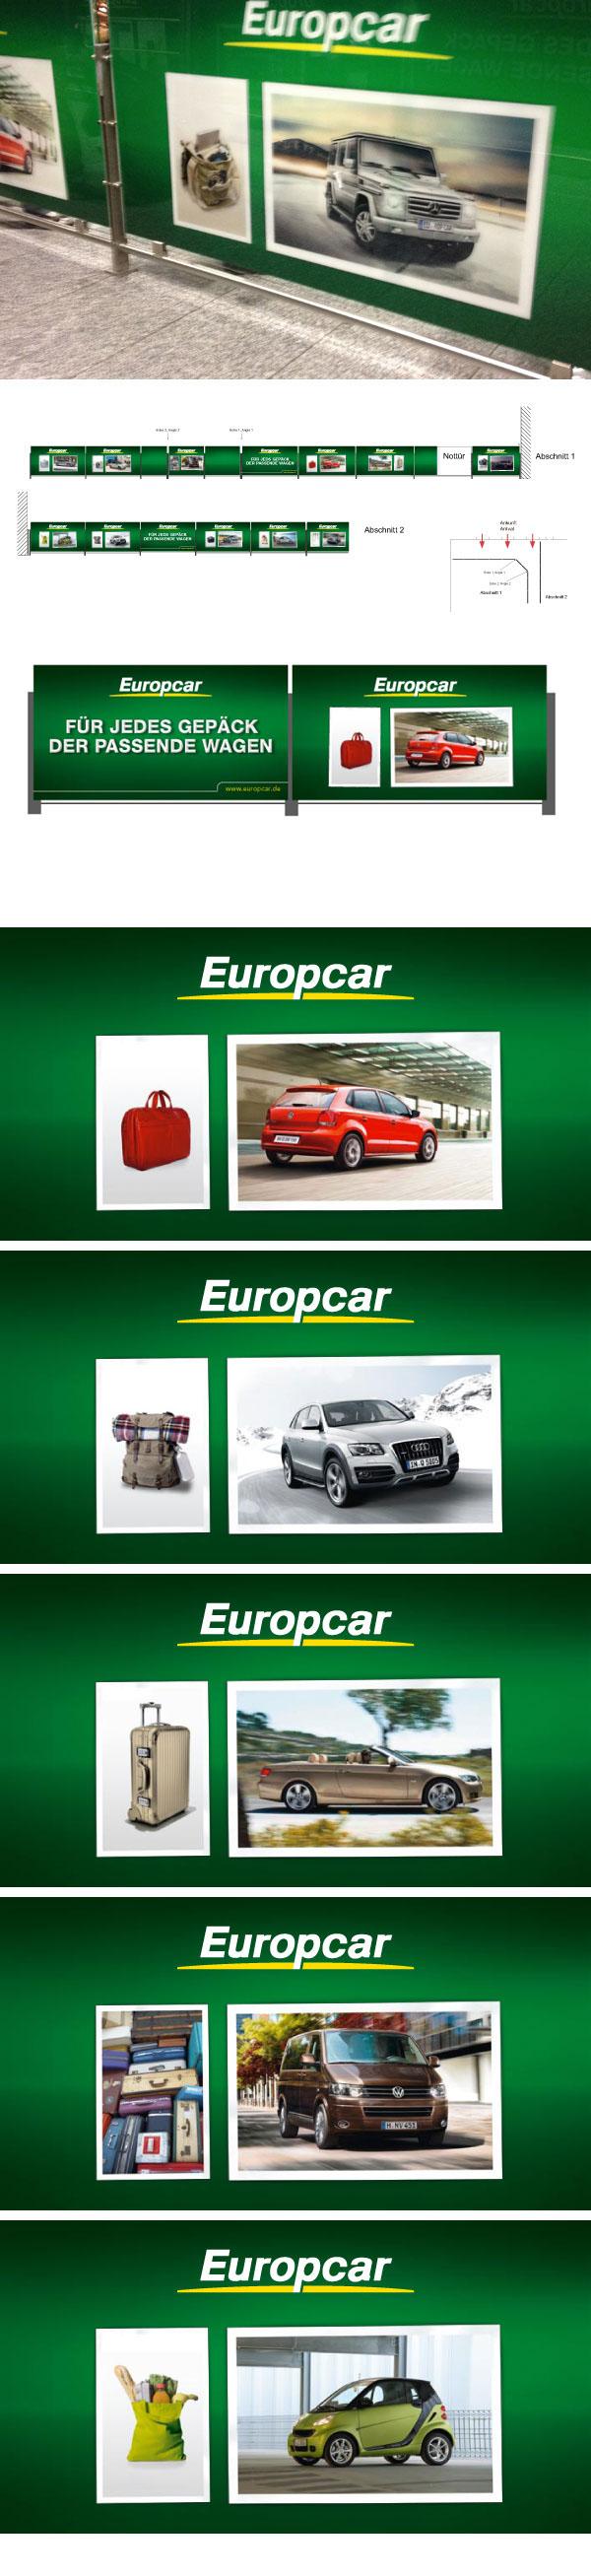 Europcar Welcome Branding Frankfurt Advertising On Behance